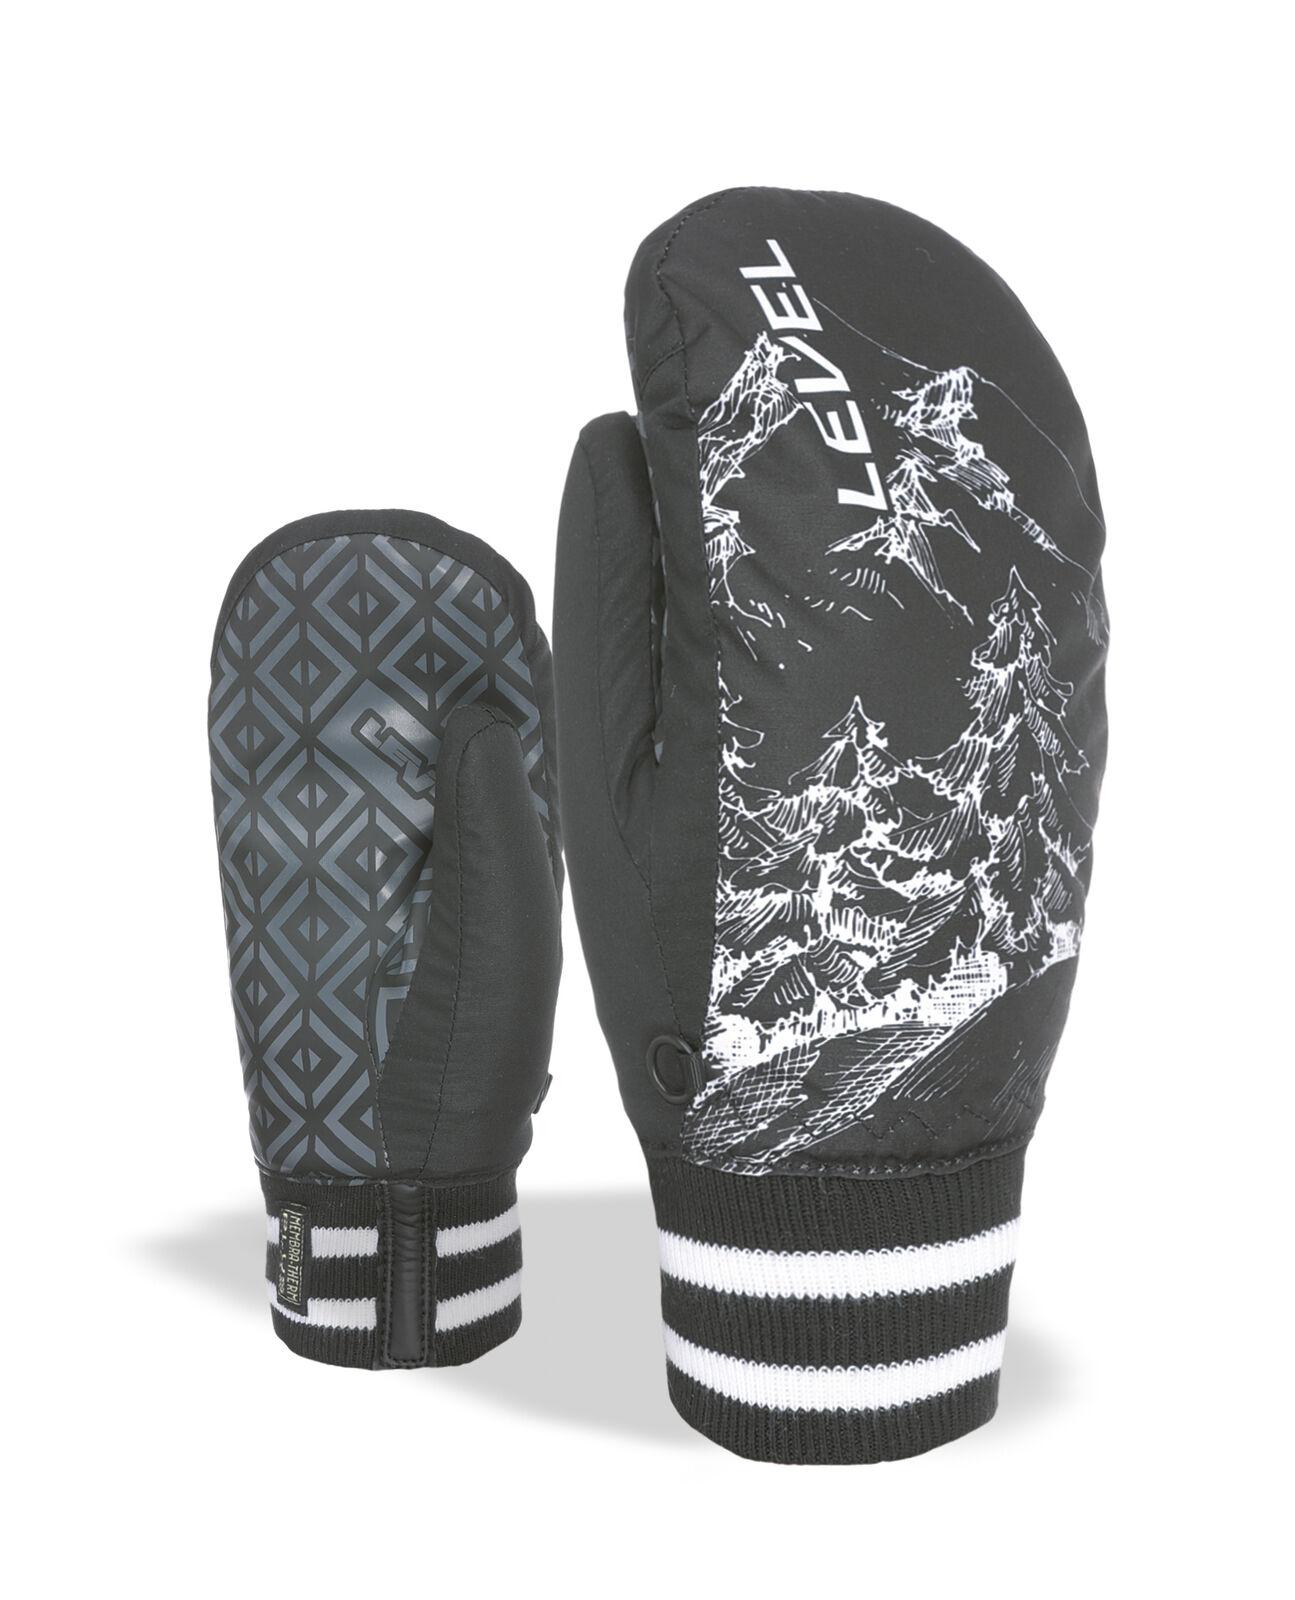 Level Handschuh  Sneaker Jr grey wasserdicht atmungsaktiv  wärmend  latest styles